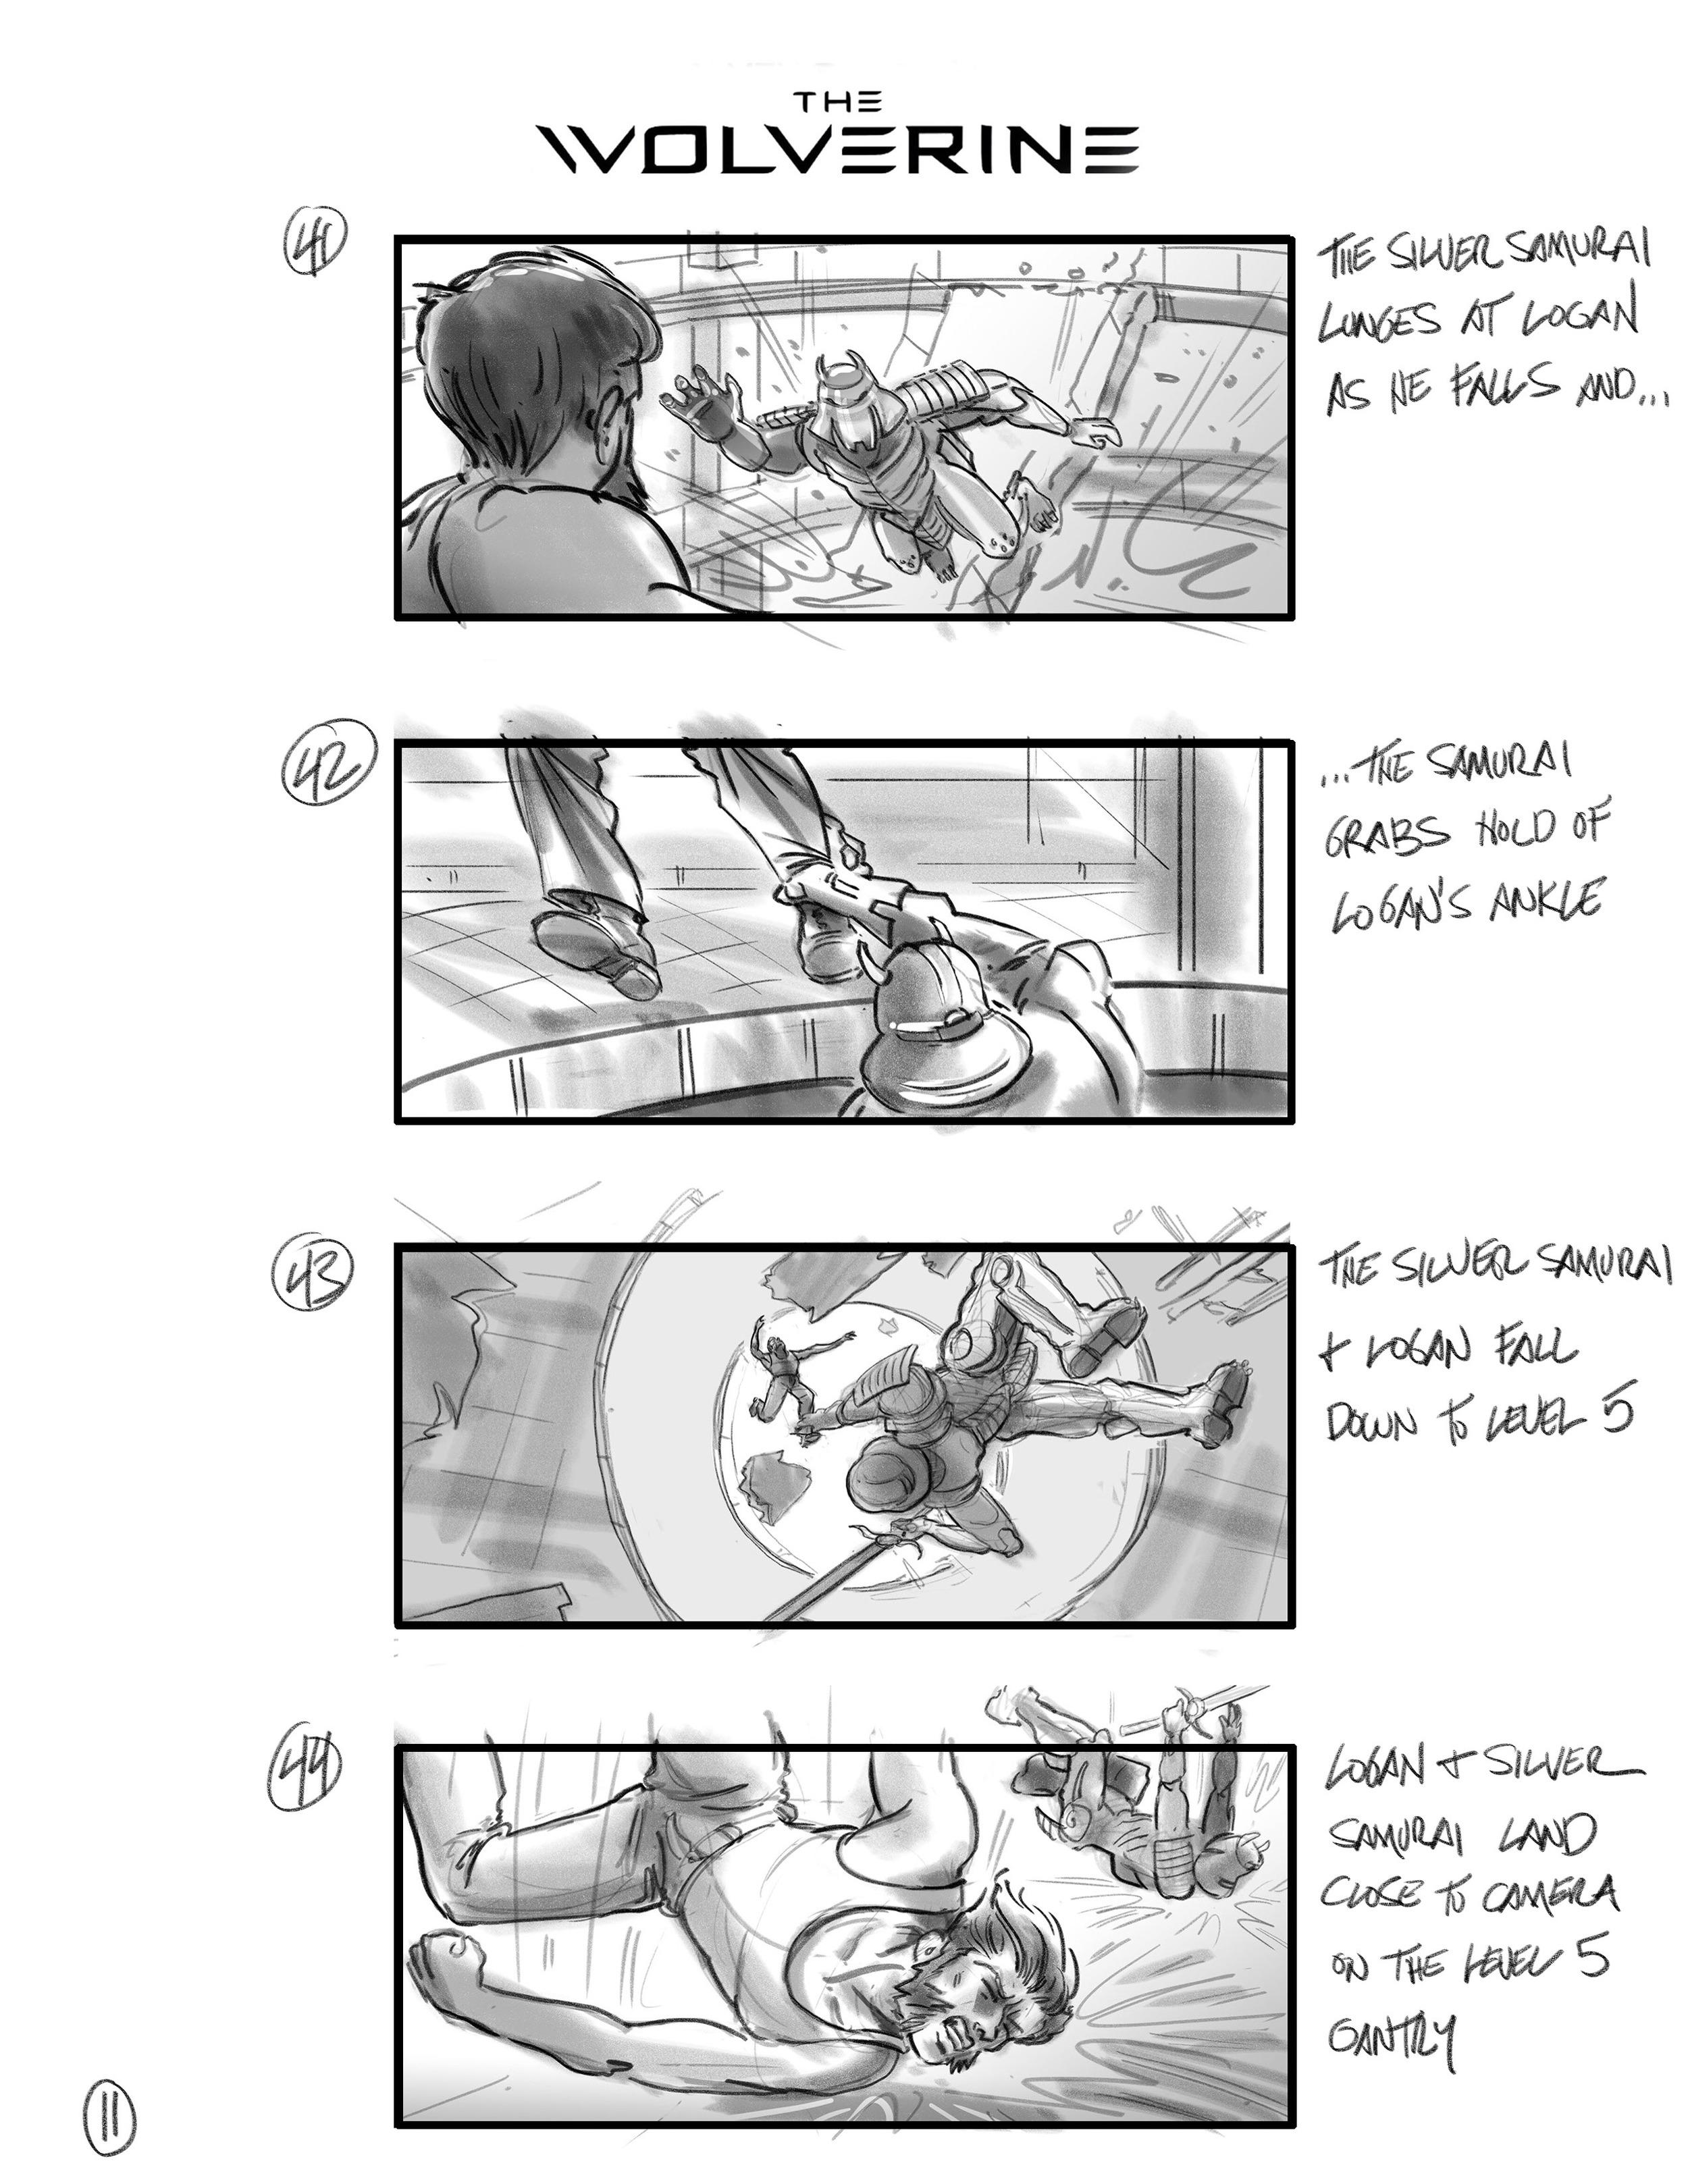 Silver Samurai_01_Page_5.jpg